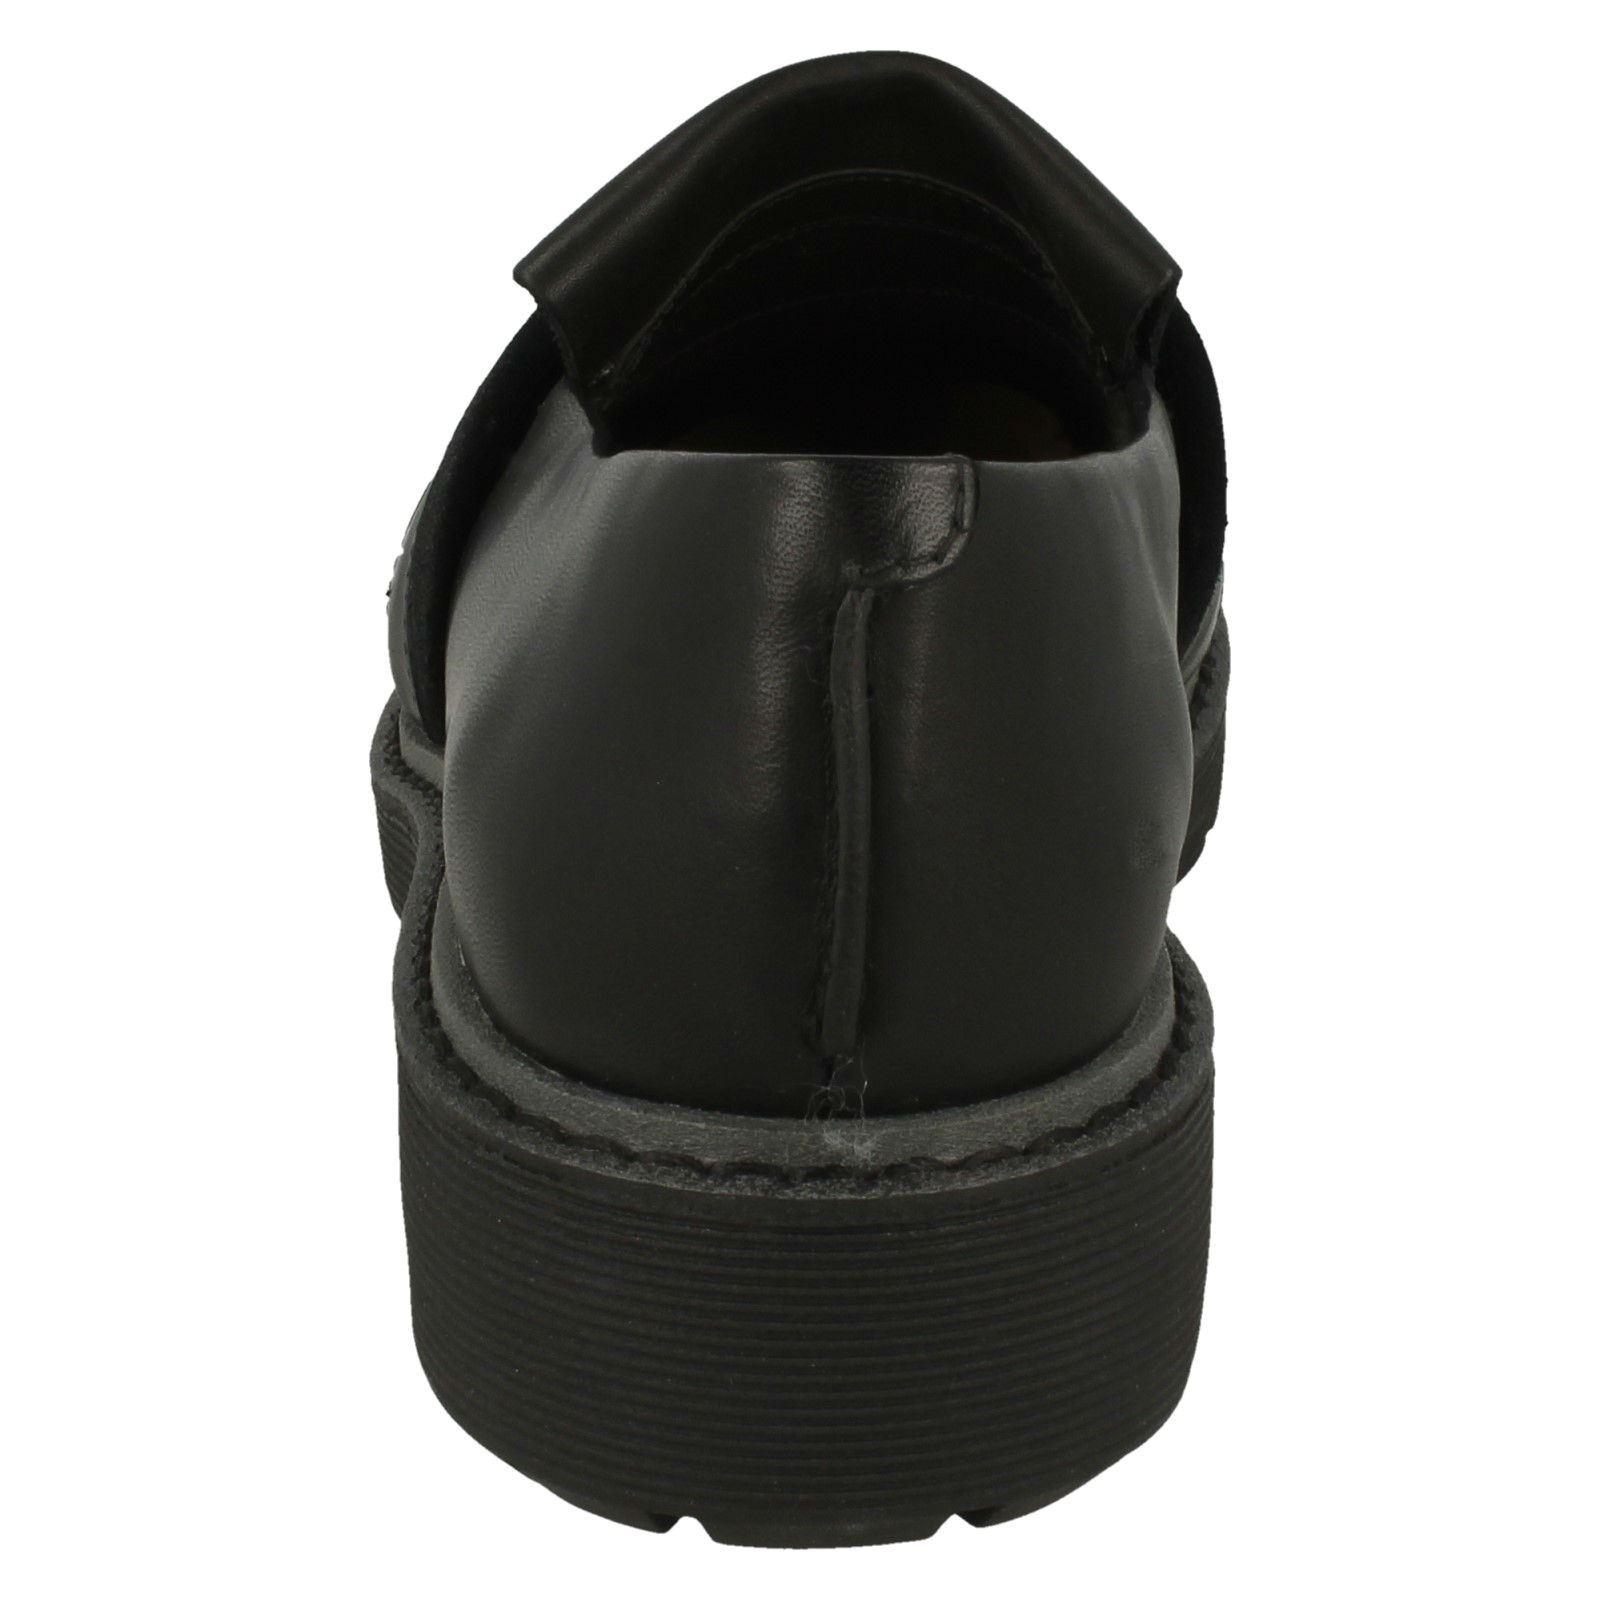 en inspirados Clarks mocasines Ruby Clarks mujer Zapatos Alexa Black para vCTwqE